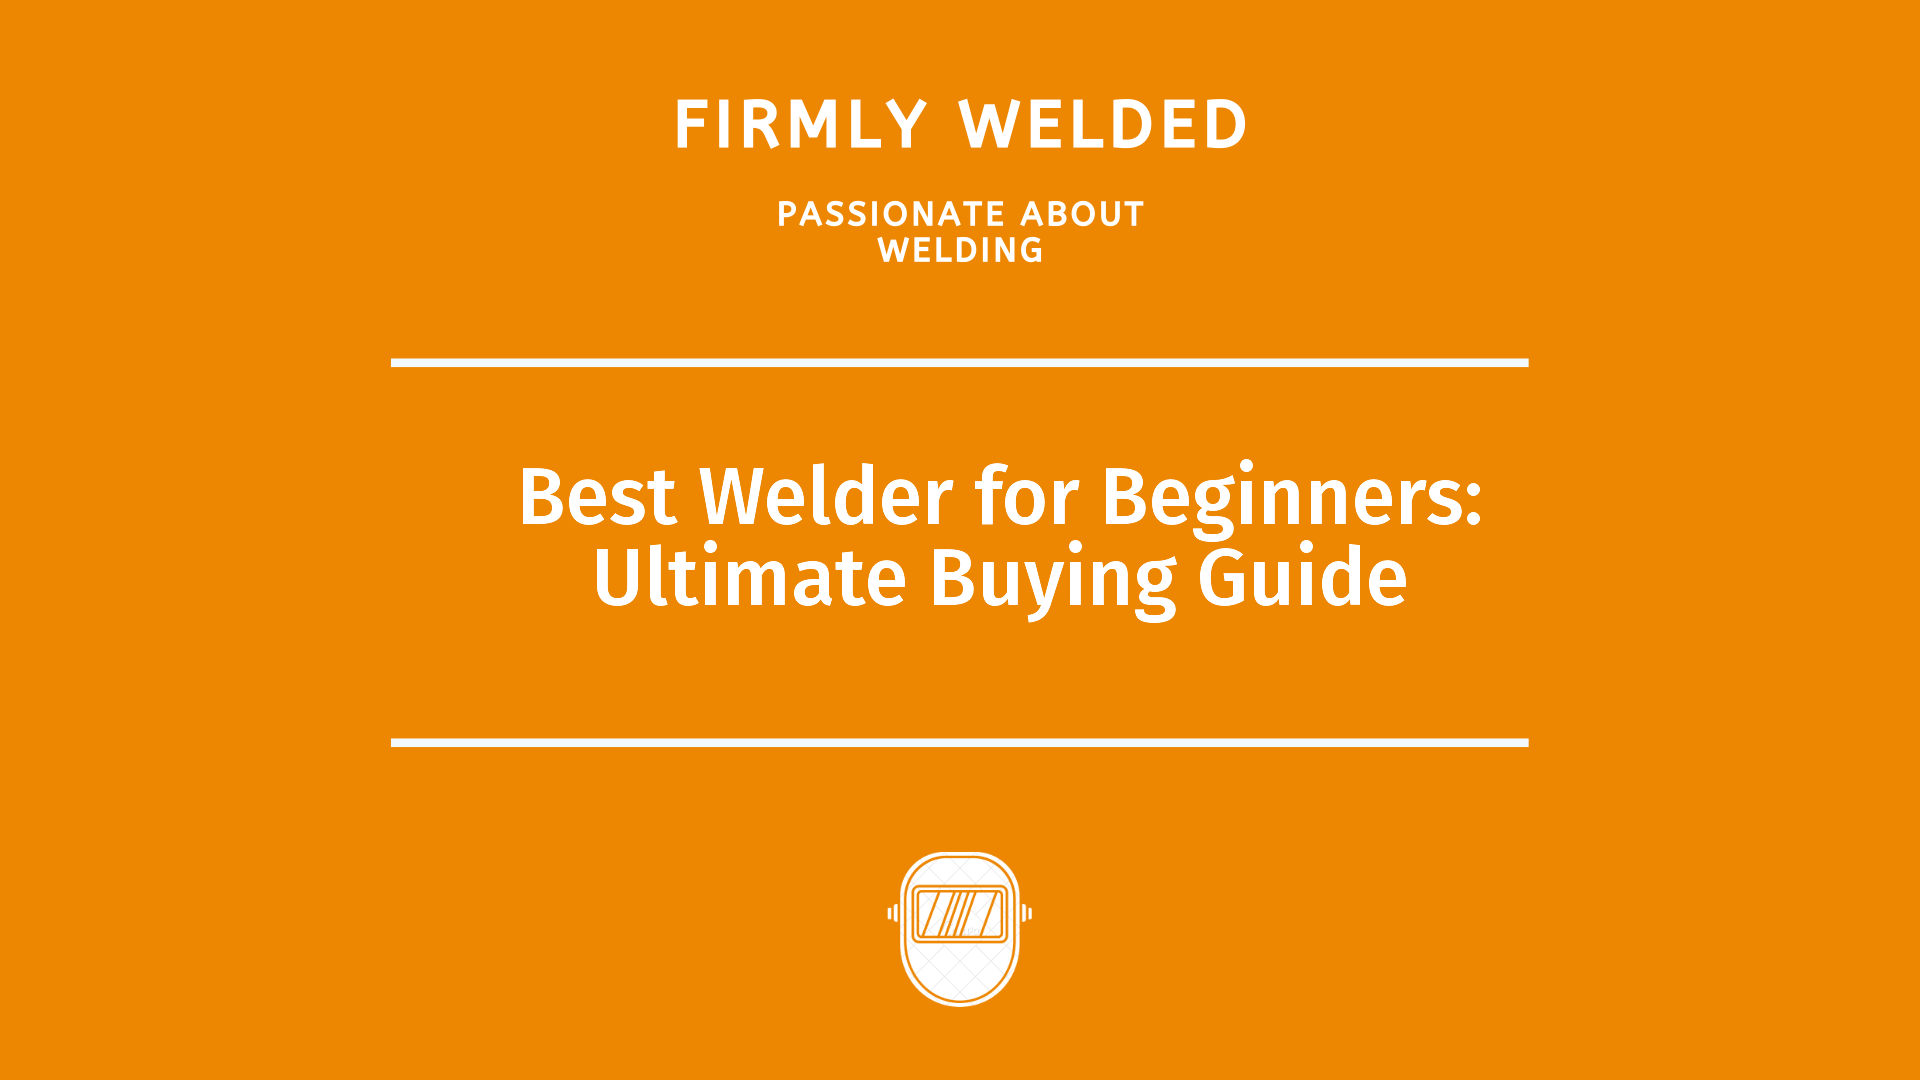 Best Welder for Beginners: Ultimate Buying Guide